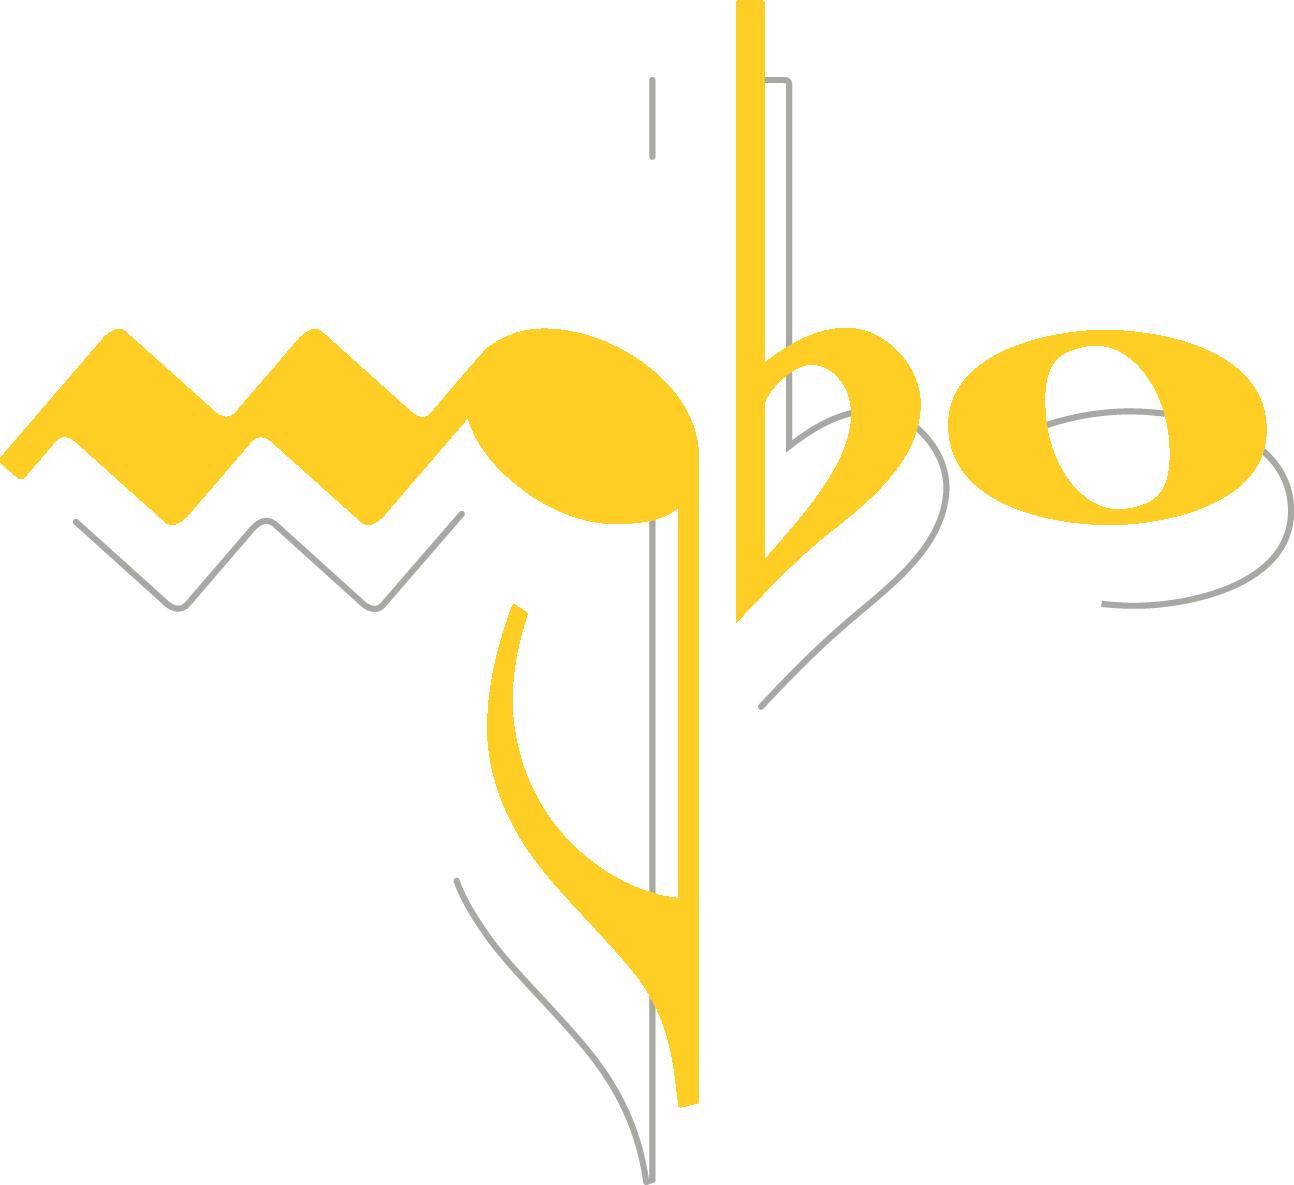 wjbo_logo_farbig-Kopie